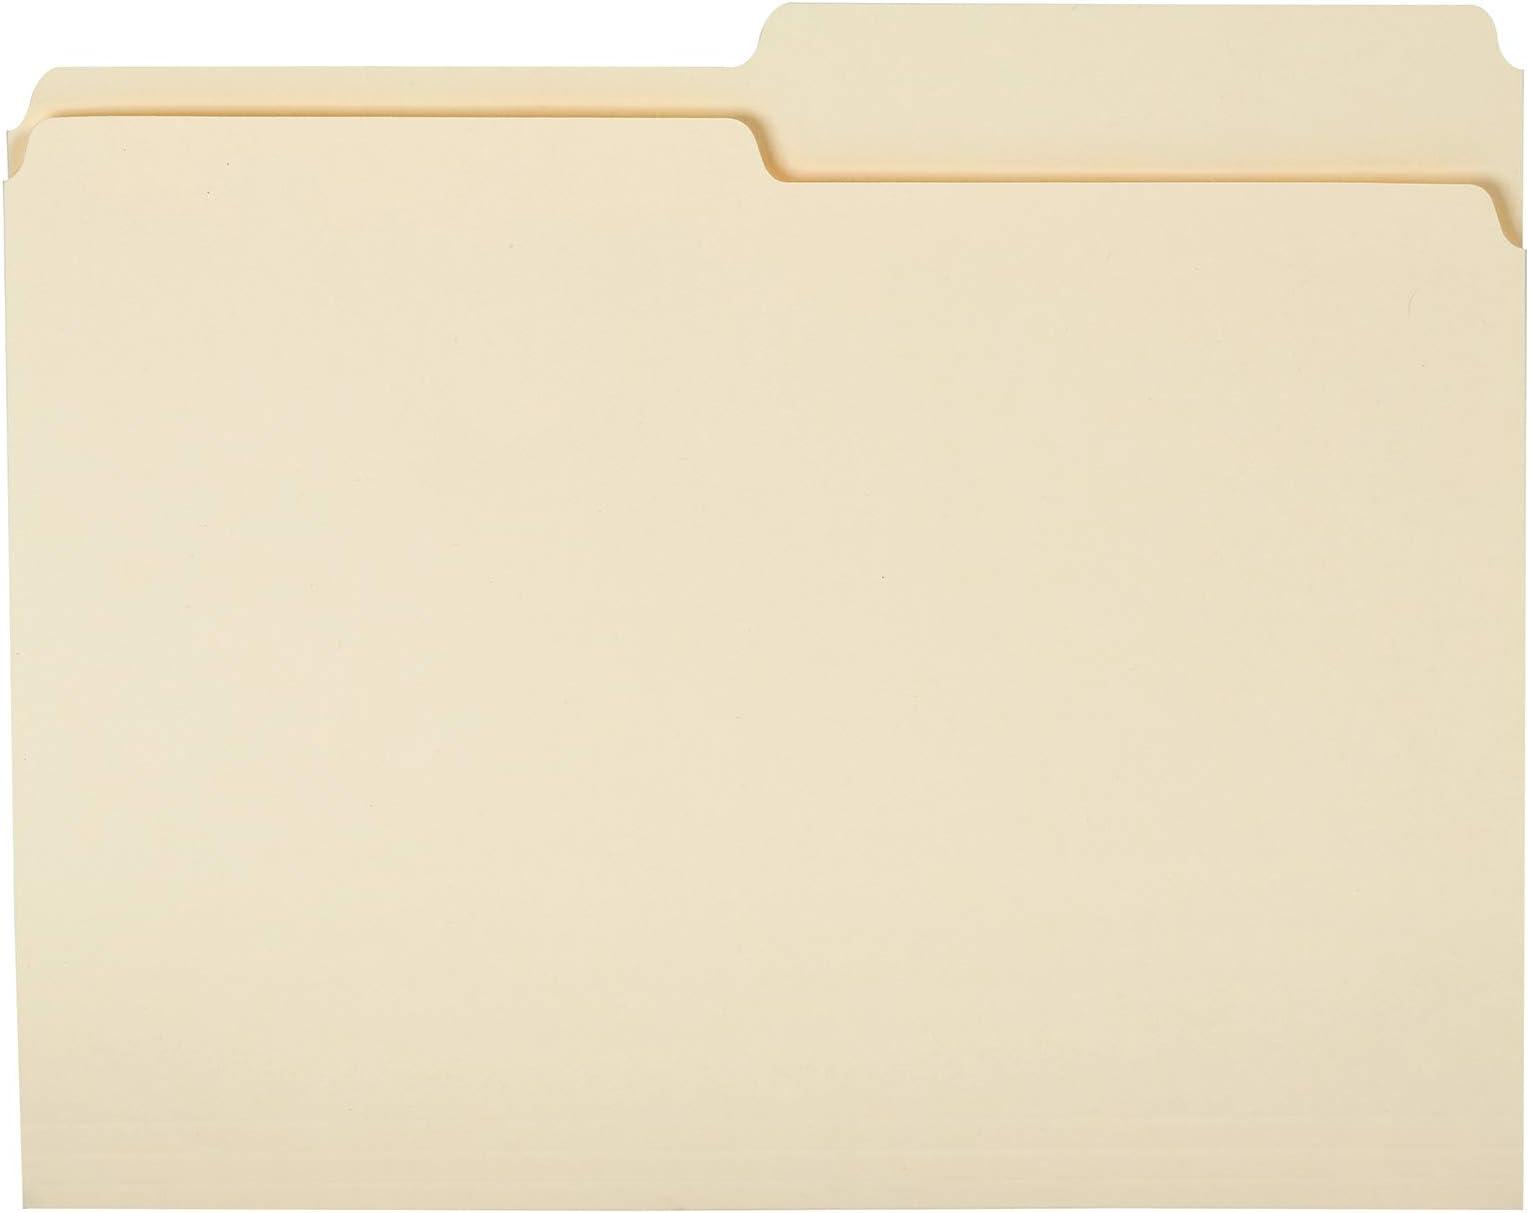 Amazon Basics File Folders - 1/2 Tab, Manila, Letter Size, 36-Pack